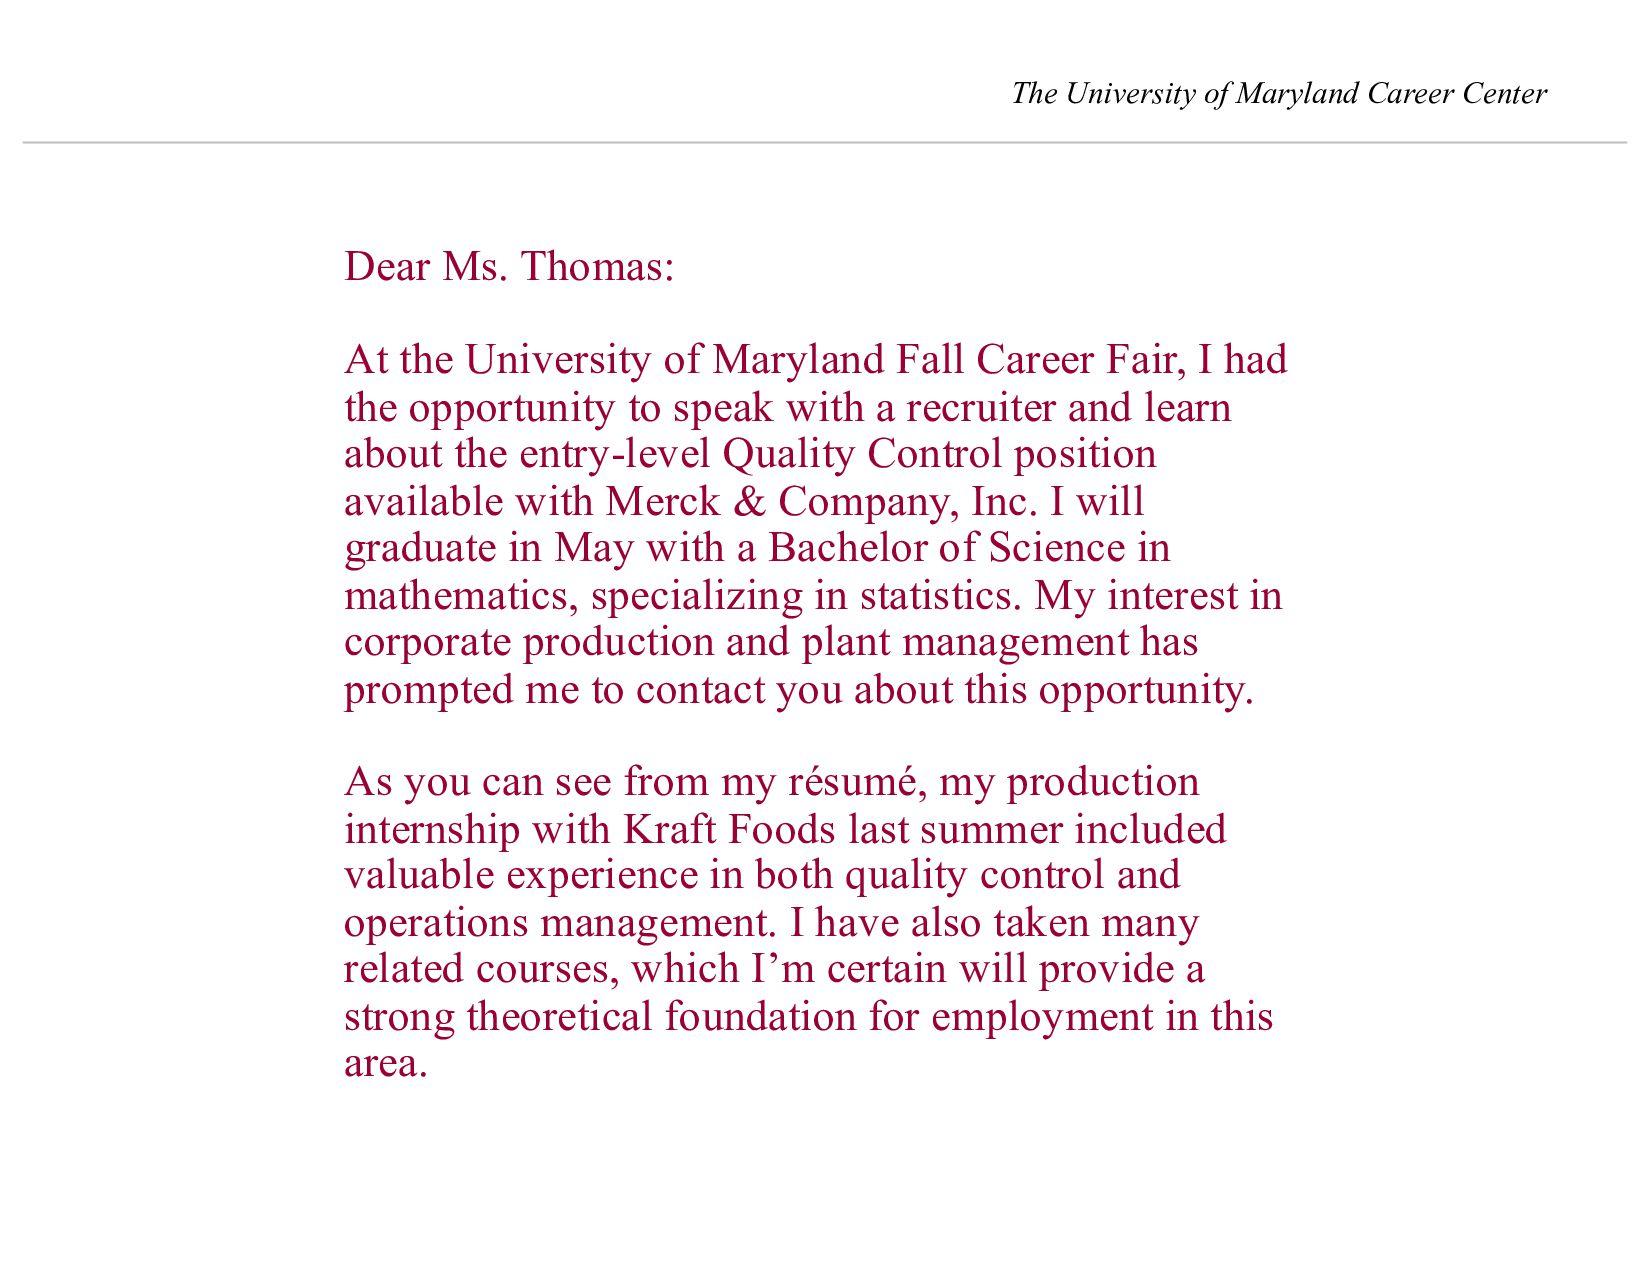 COUNTER- ARGUMENT